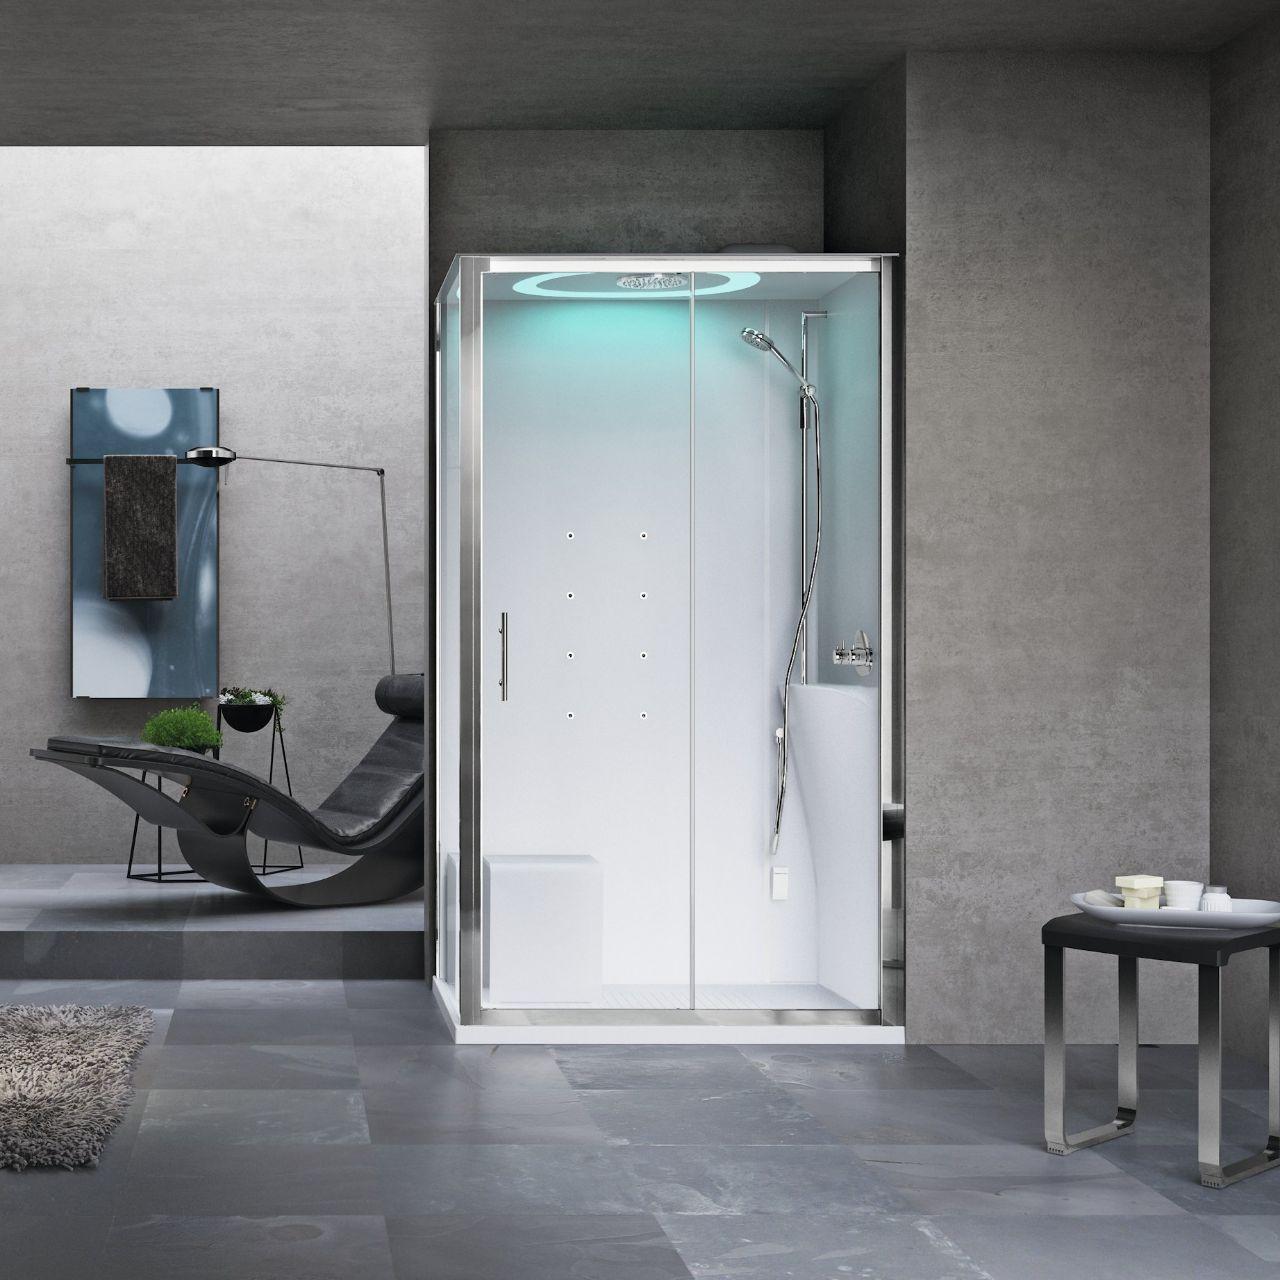 cabine doccia eon 2p120x80 novellini. Black Bedroom Furniture Sets. Home Design Ideas